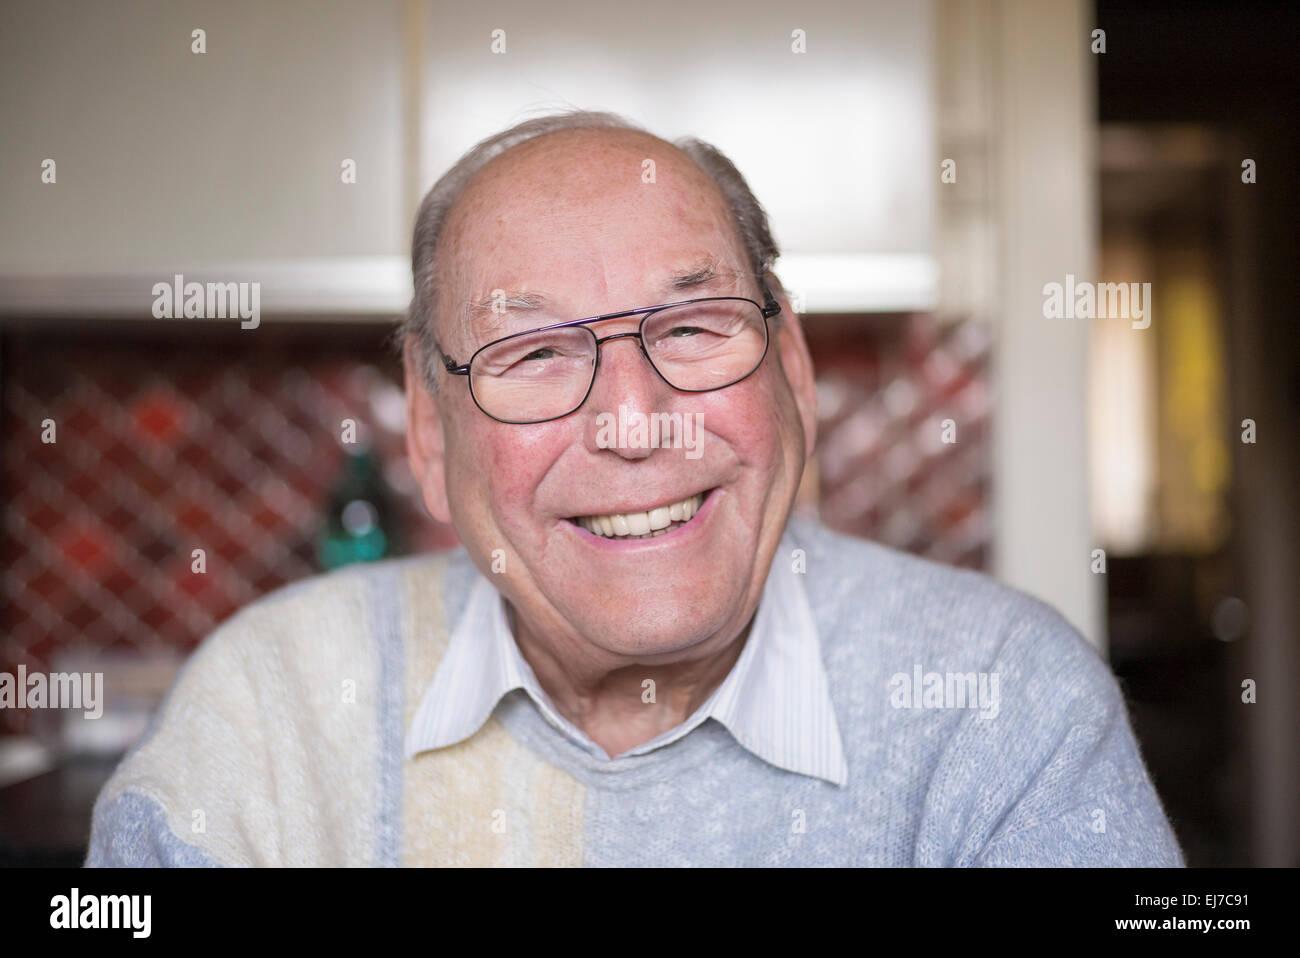 80 s lächelnden älteren Mann Porträt, Porträt Mann Lachen Stockfoto